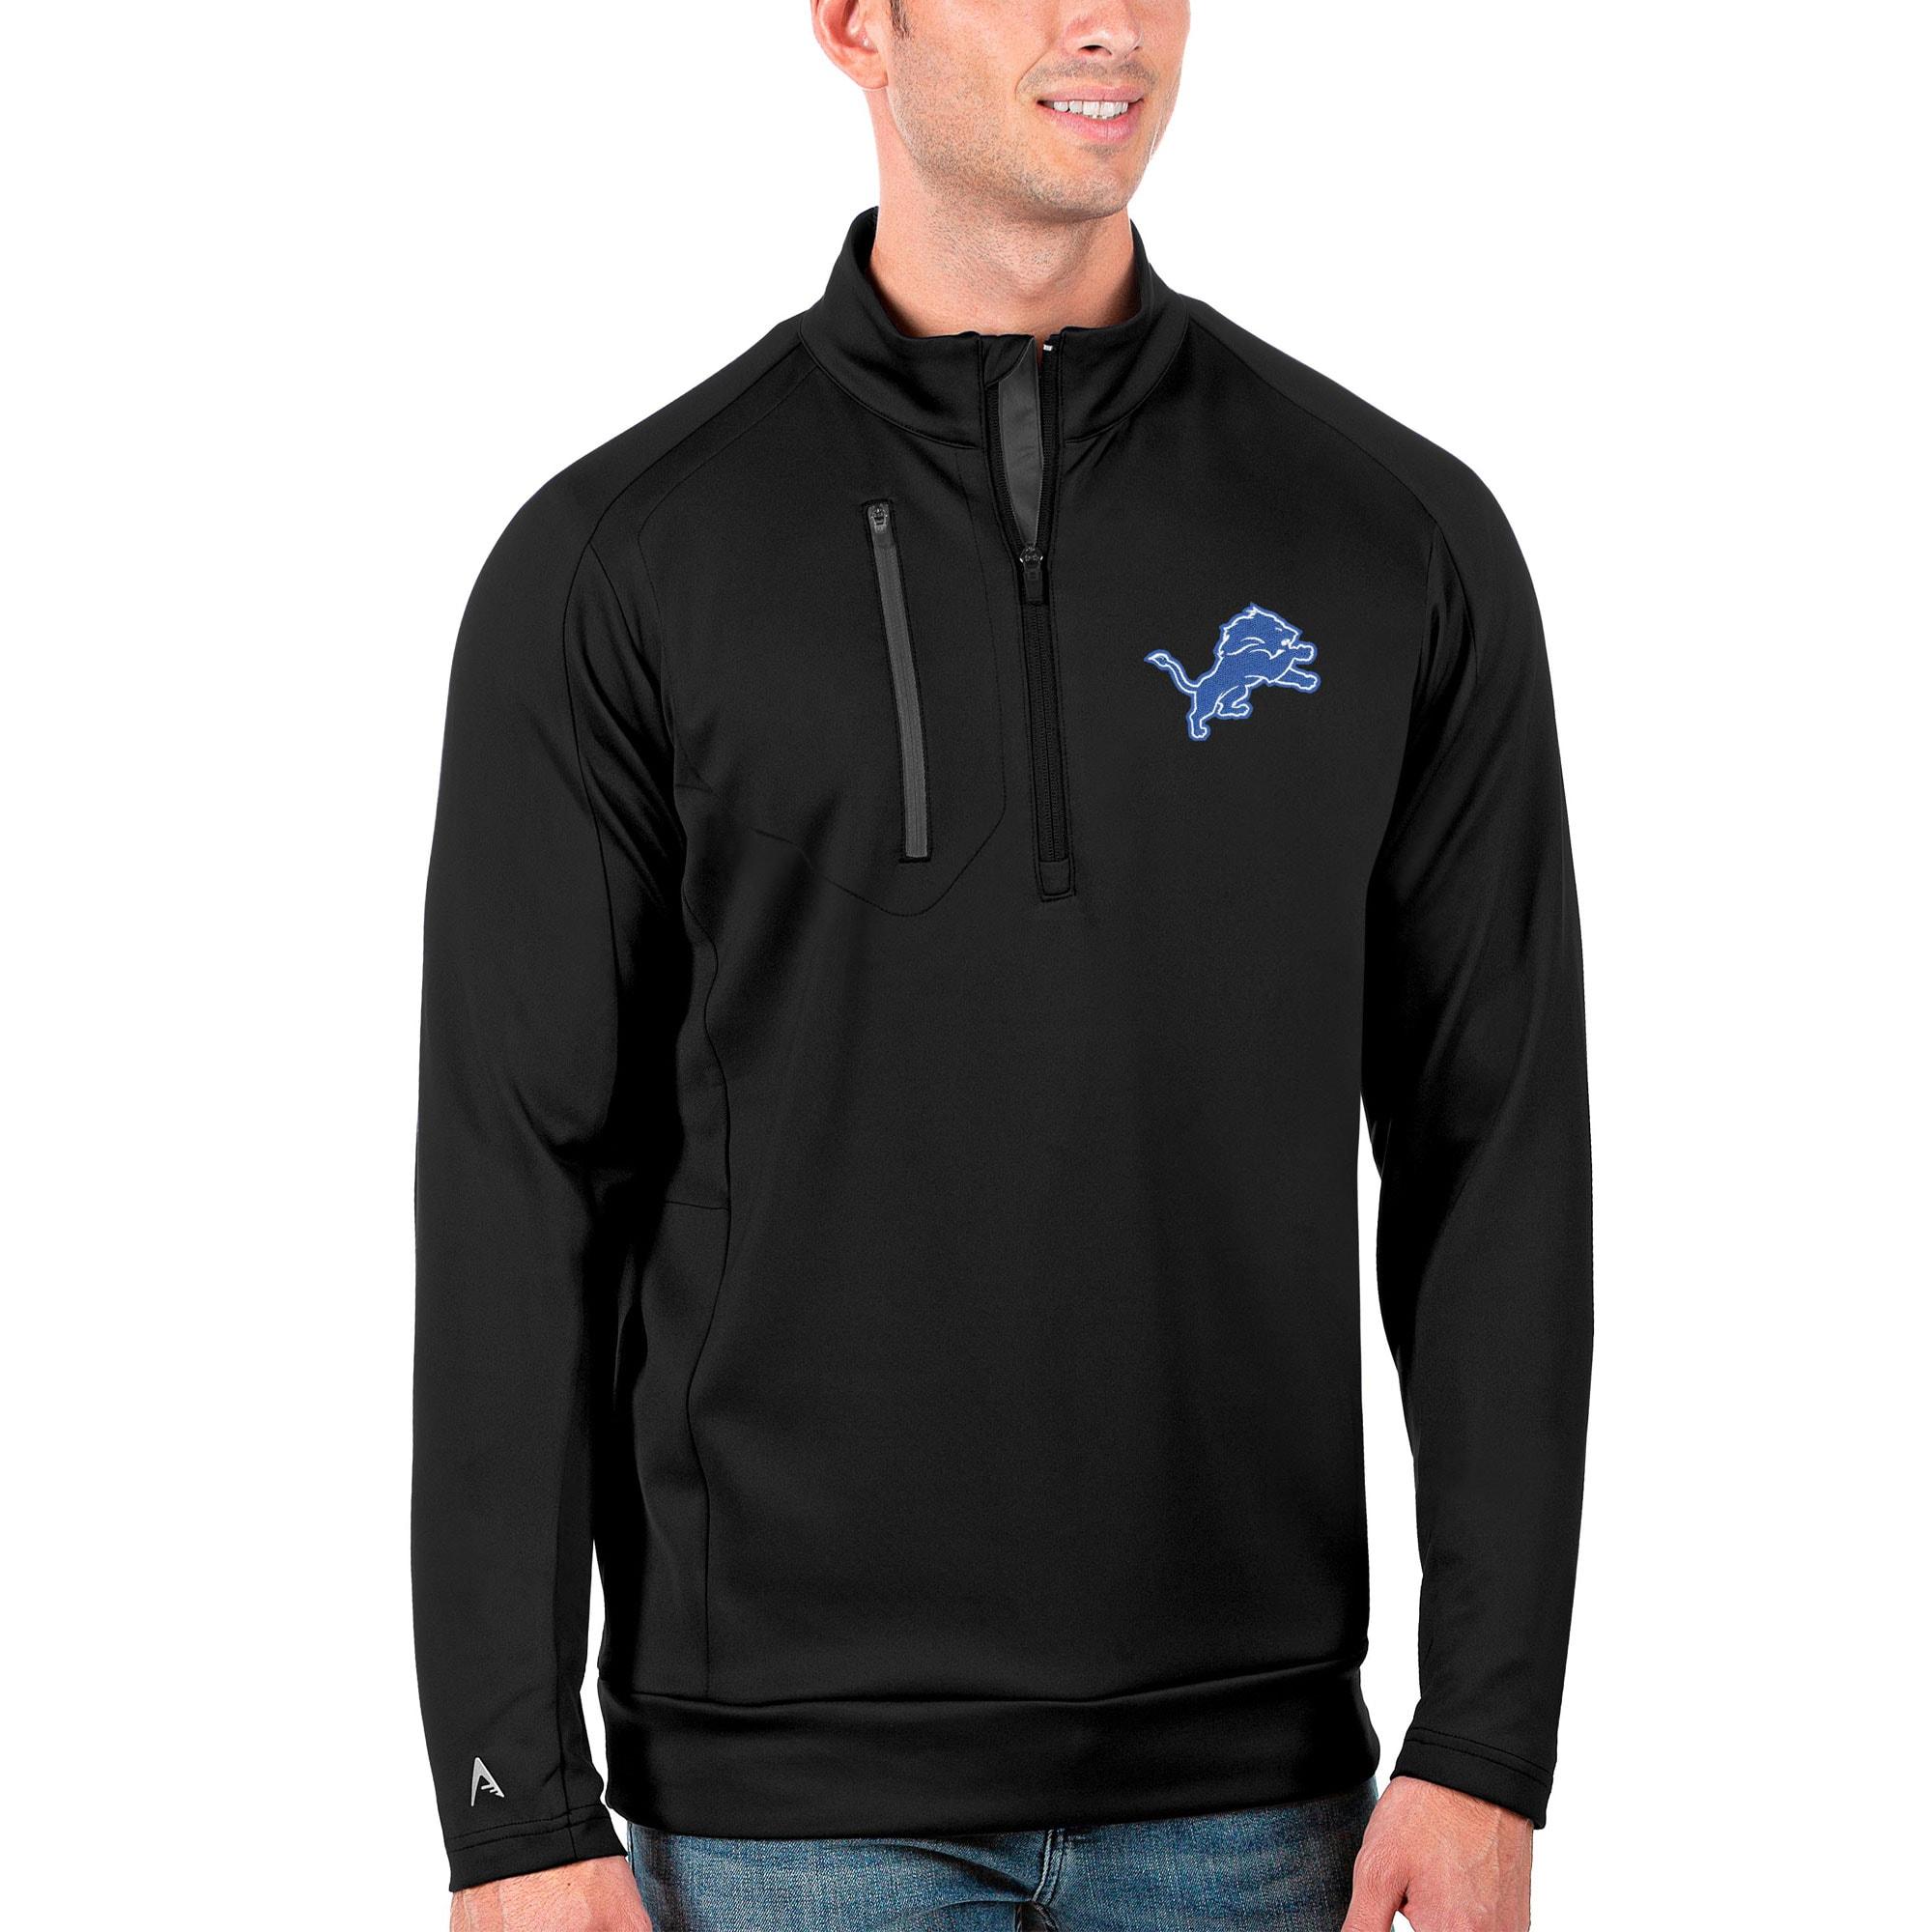 Detroit Lions Antigua Generation Quarter-Zip Pullover Jacket - Black/Charcoal